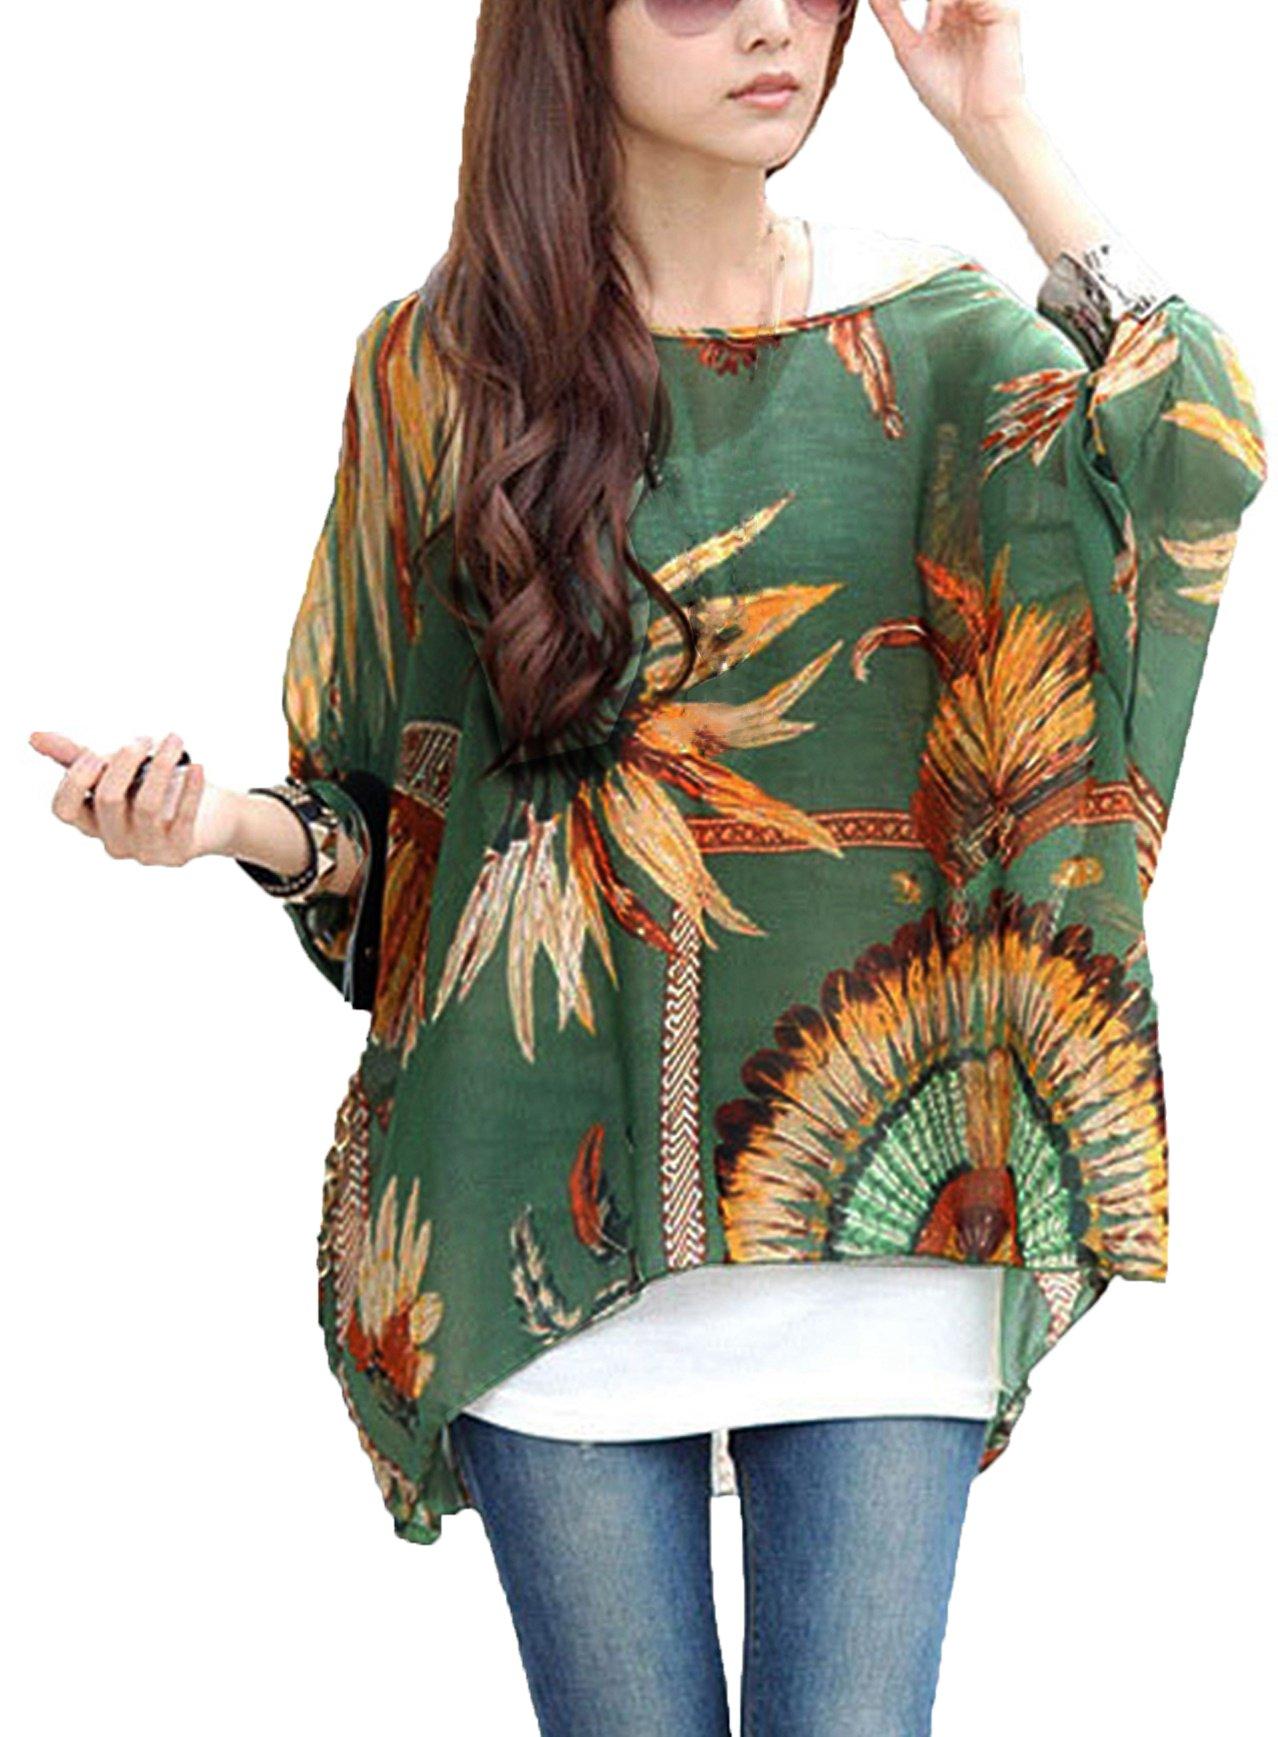 iNewbetter Womens Floral Batwing Sleeve Chiffon Beach Loose Blouse Tunic Tops 01